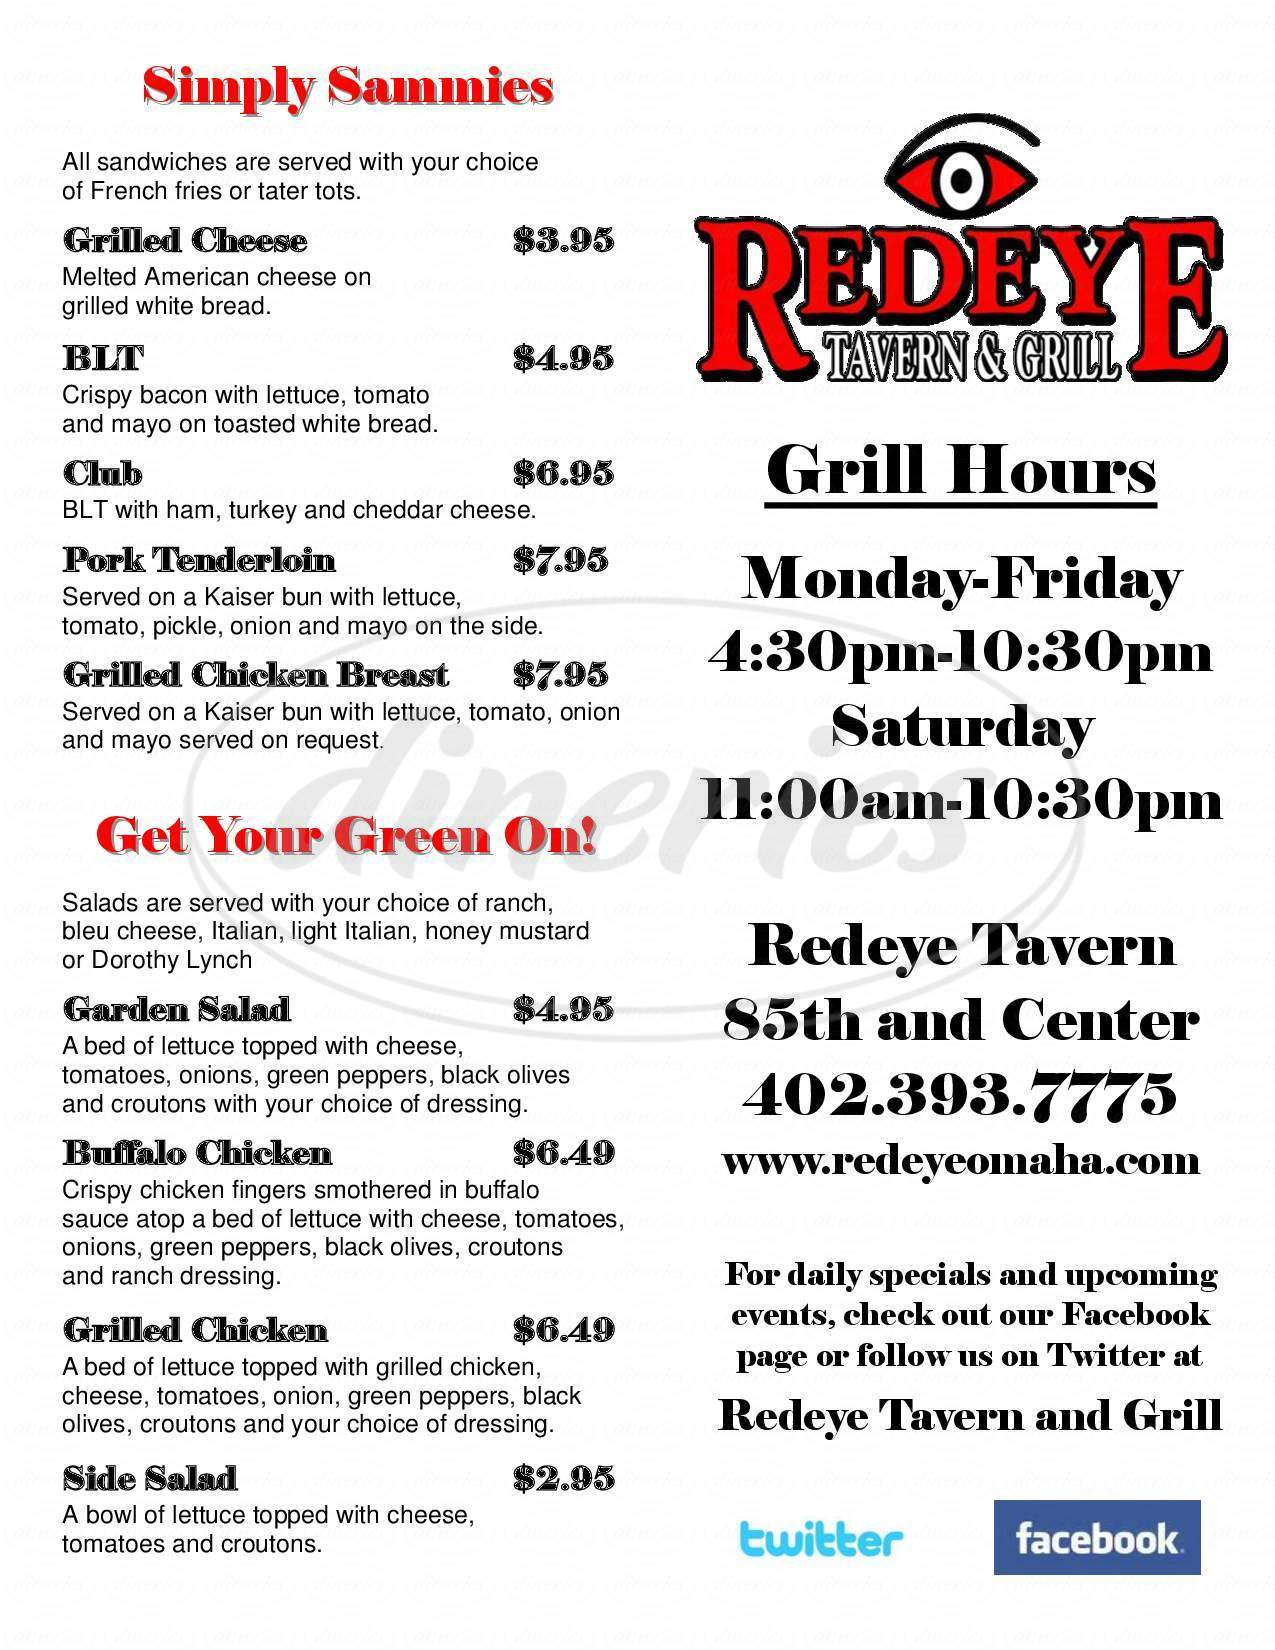 menu for Redeye Tavern